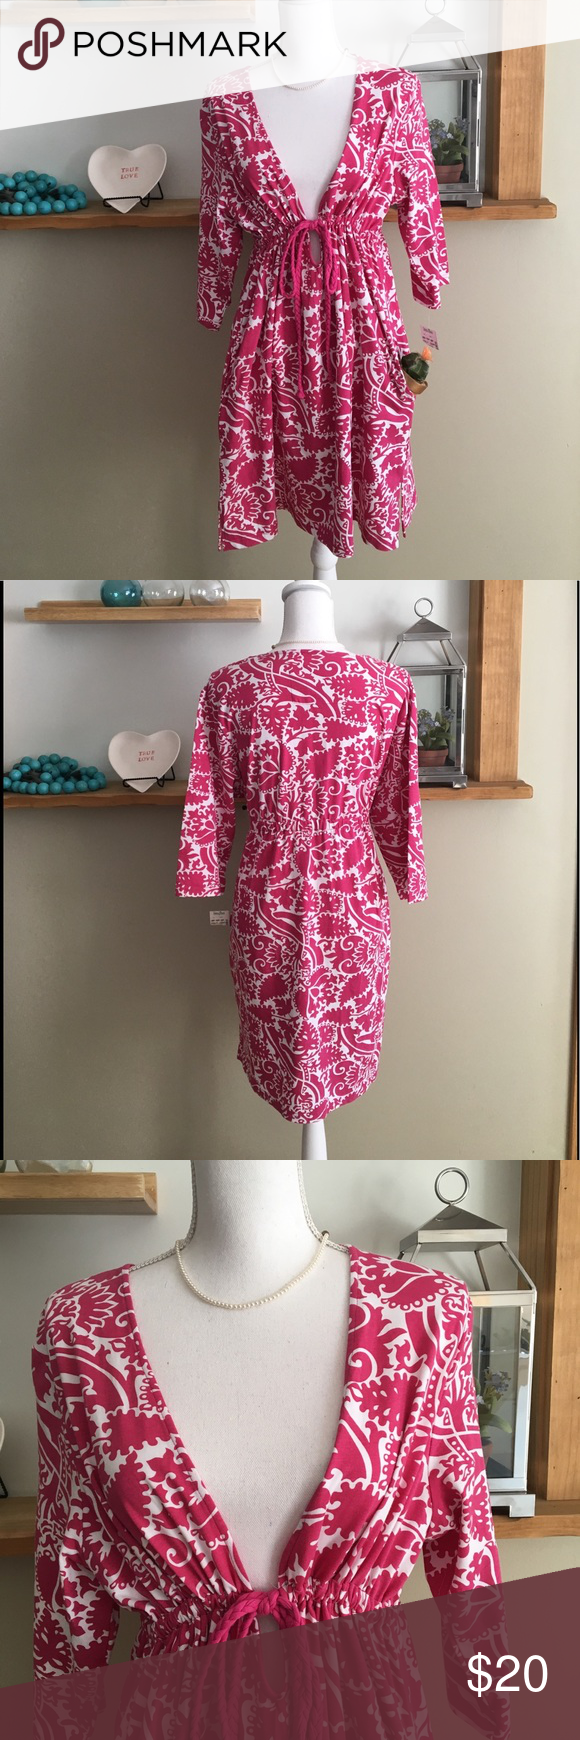 Inque Casuals Dress Size L New With Tag Casual Dress Empire Waist Dress Dresses [ 1740 x 580 Pixel ]